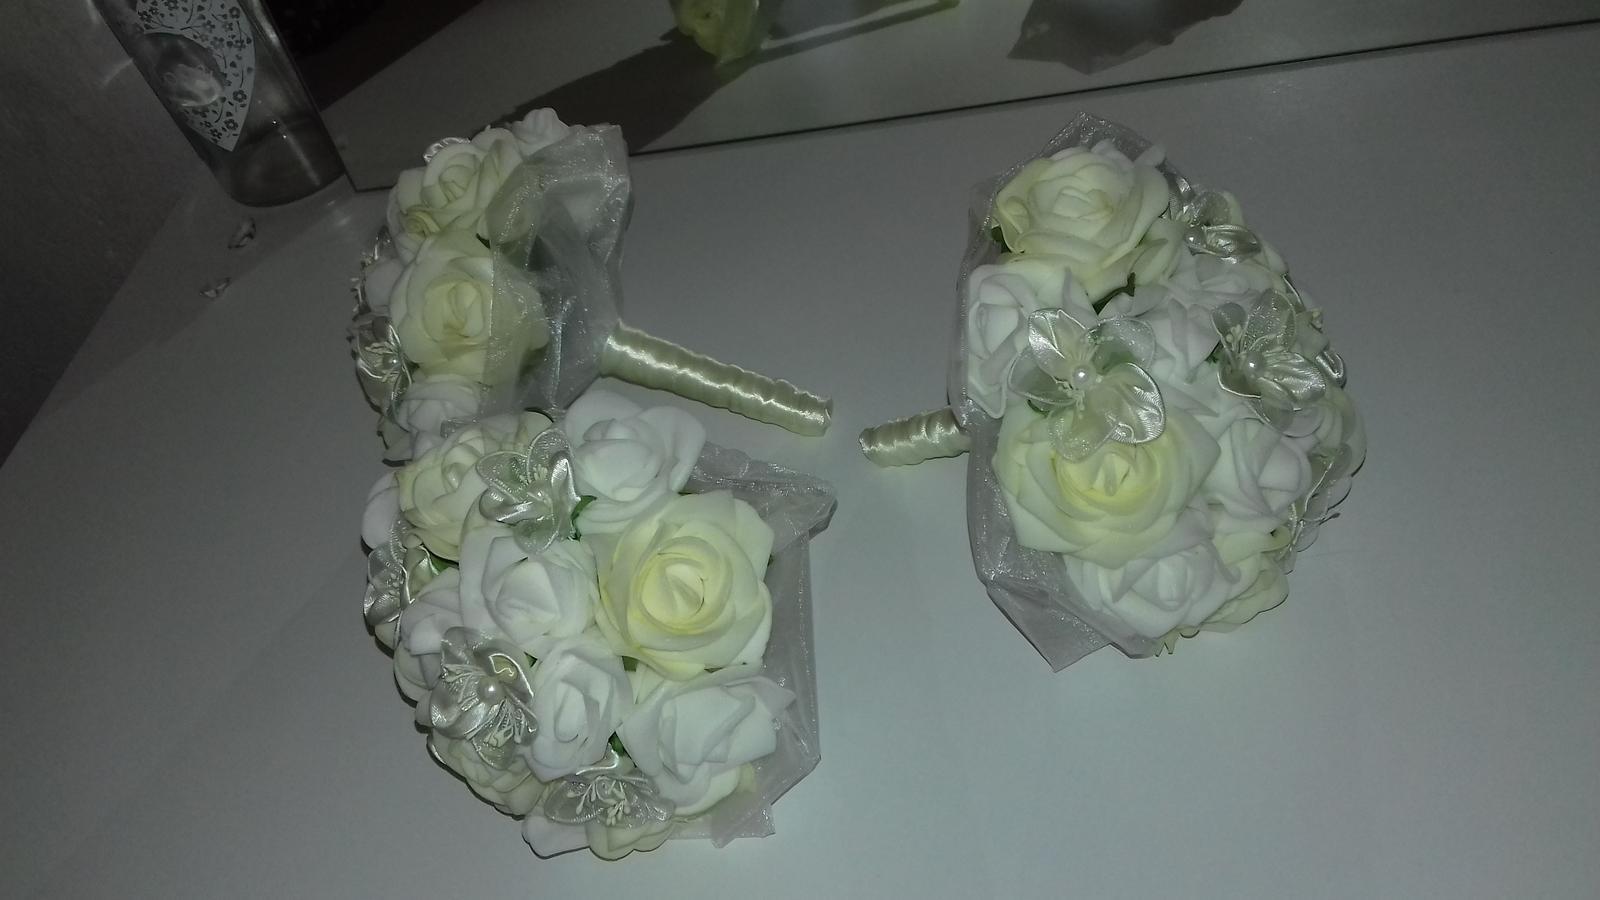 Svatební kytice sada - Obrázek č. 1